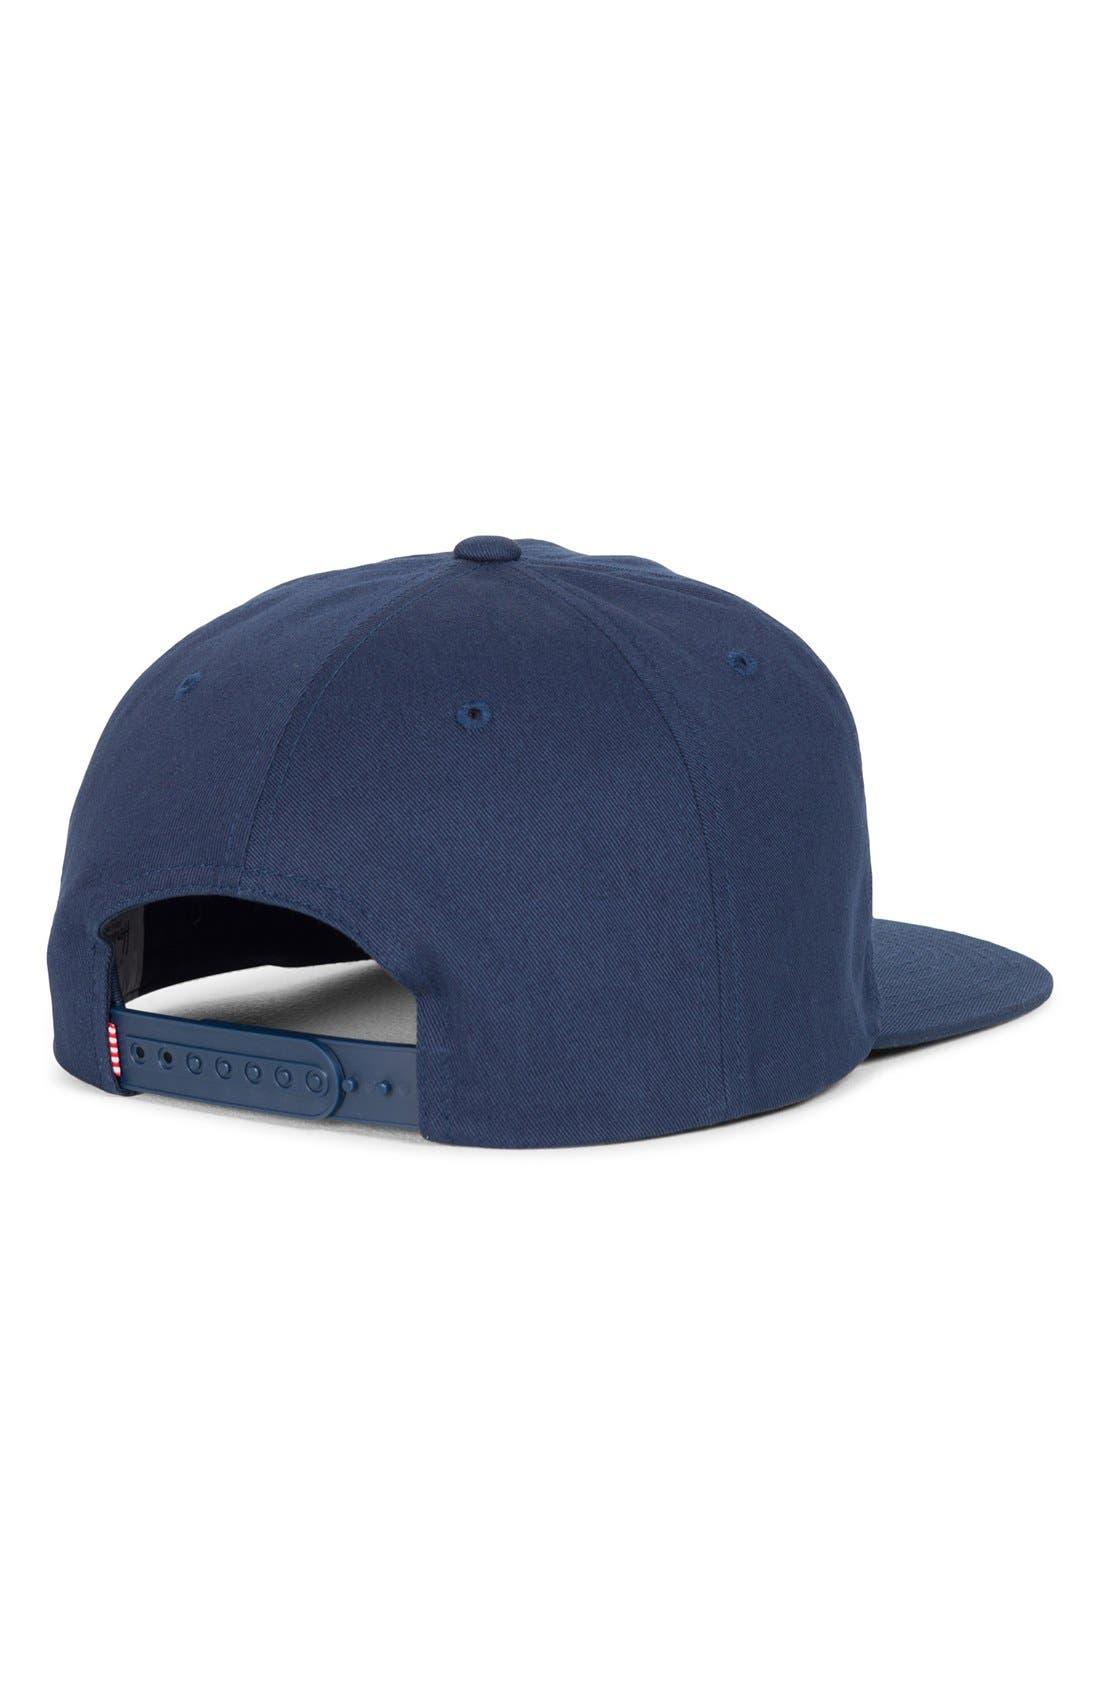 'Mosby' Snapback Baseball Cap,                             Alternate thumbnail 5, color,